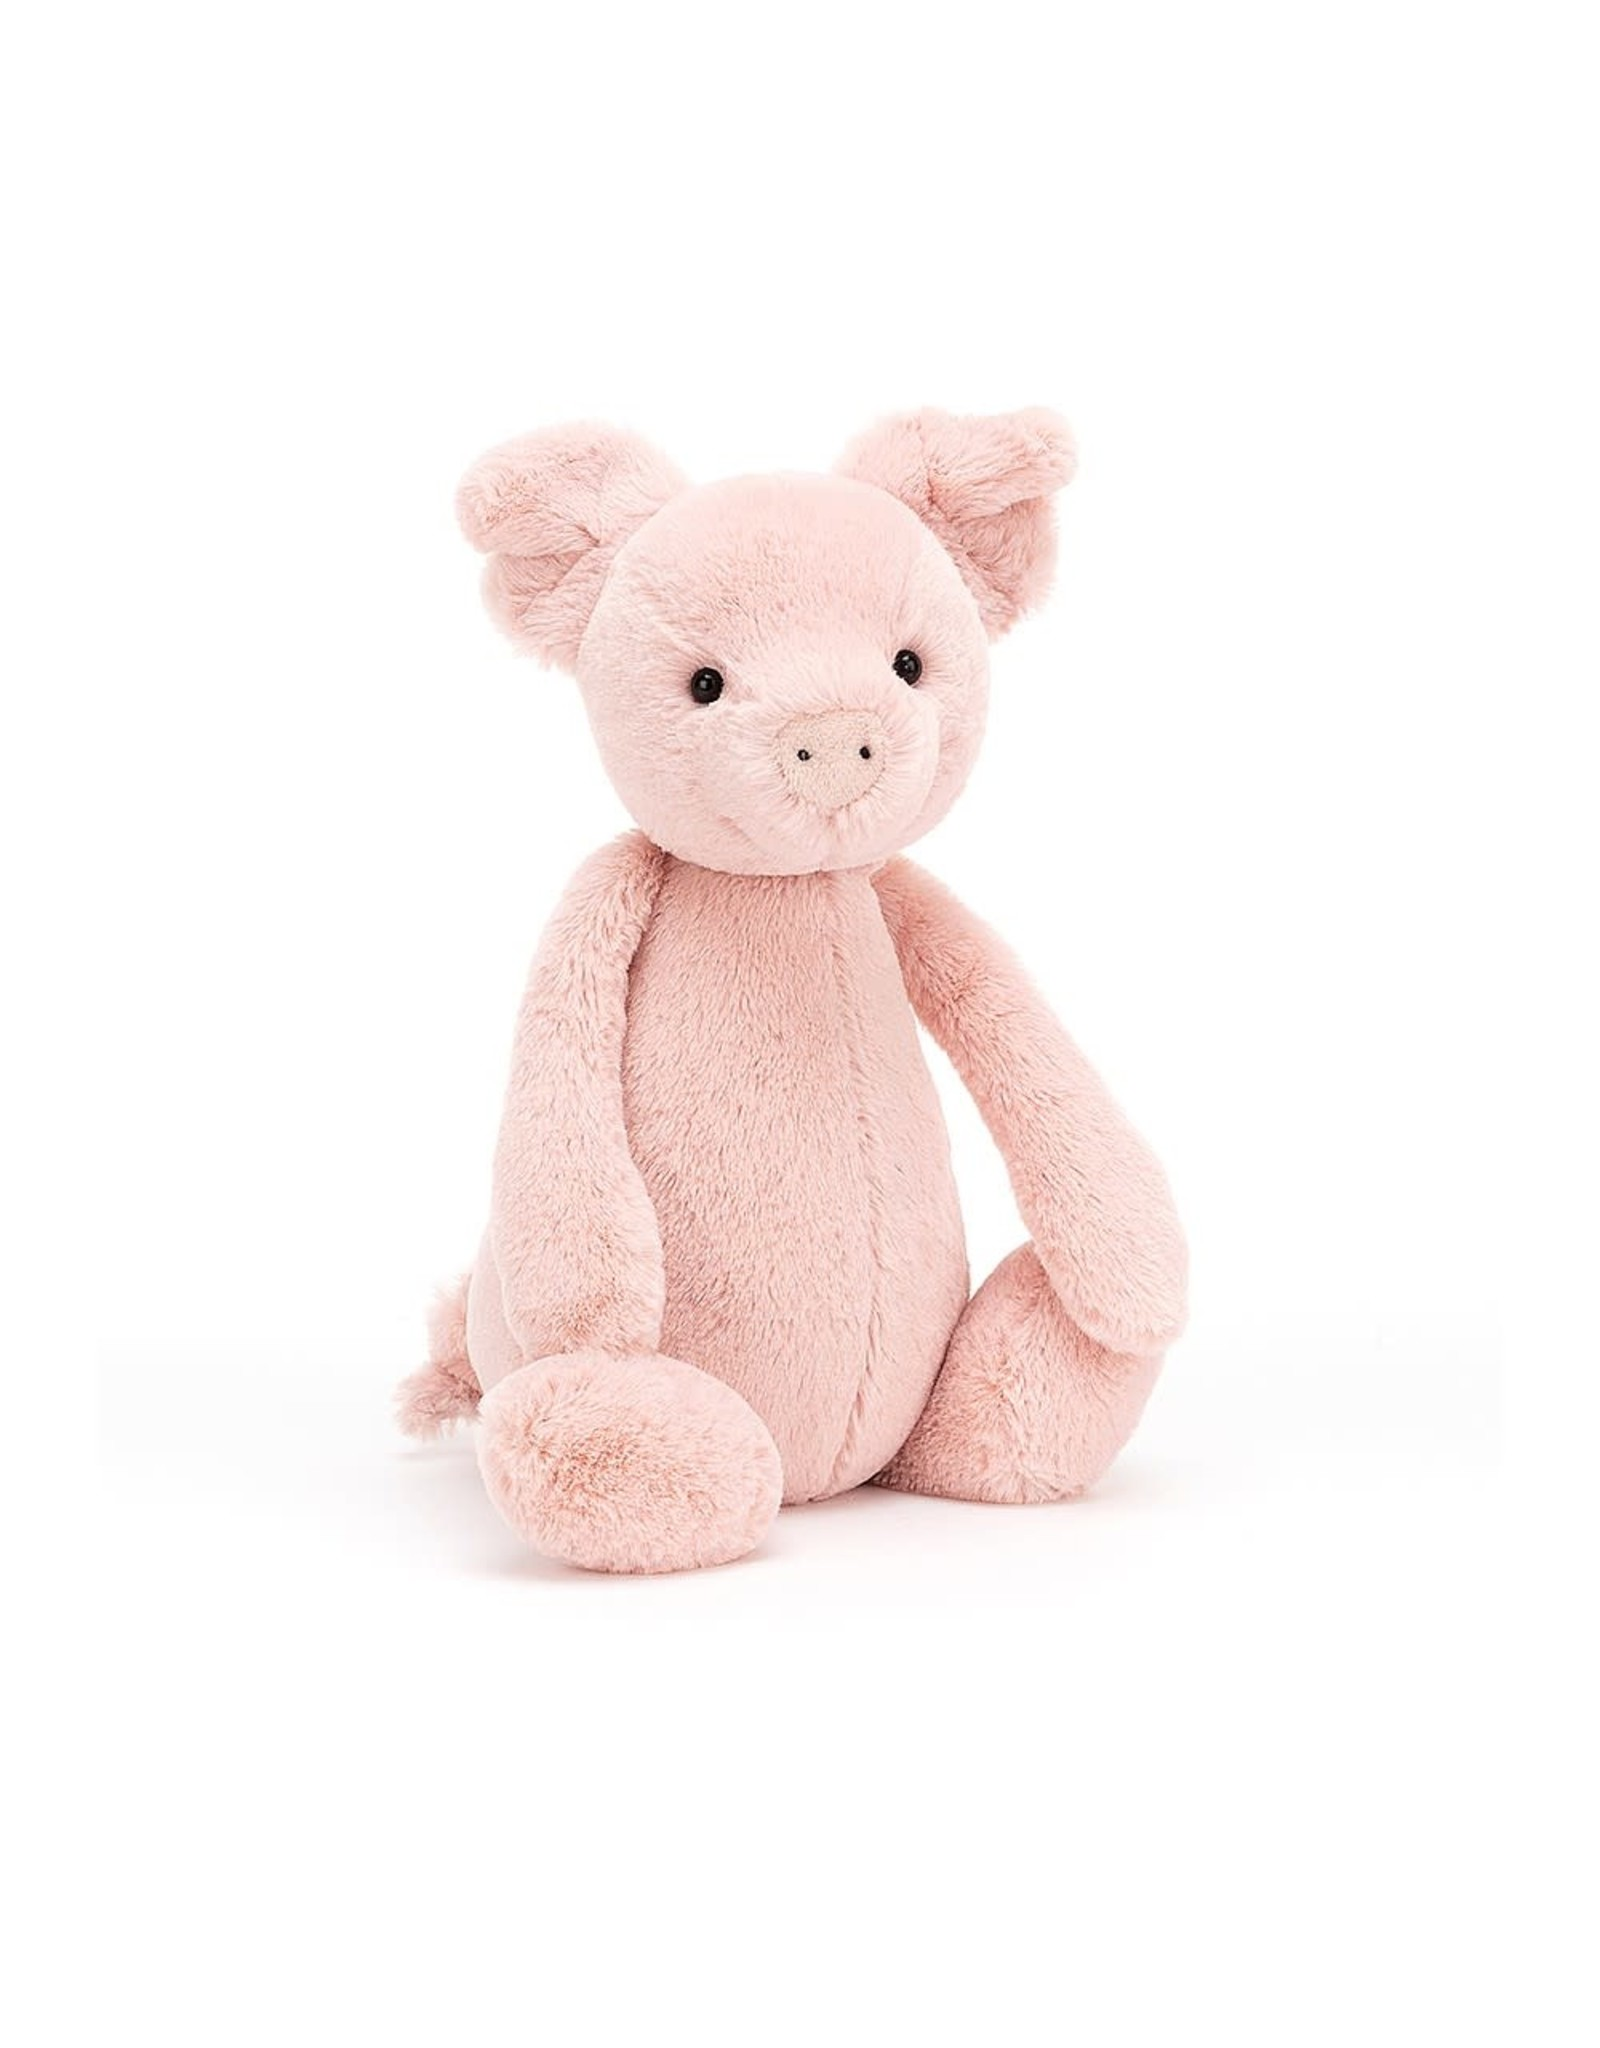 Jellycat Puffles -  Piglet